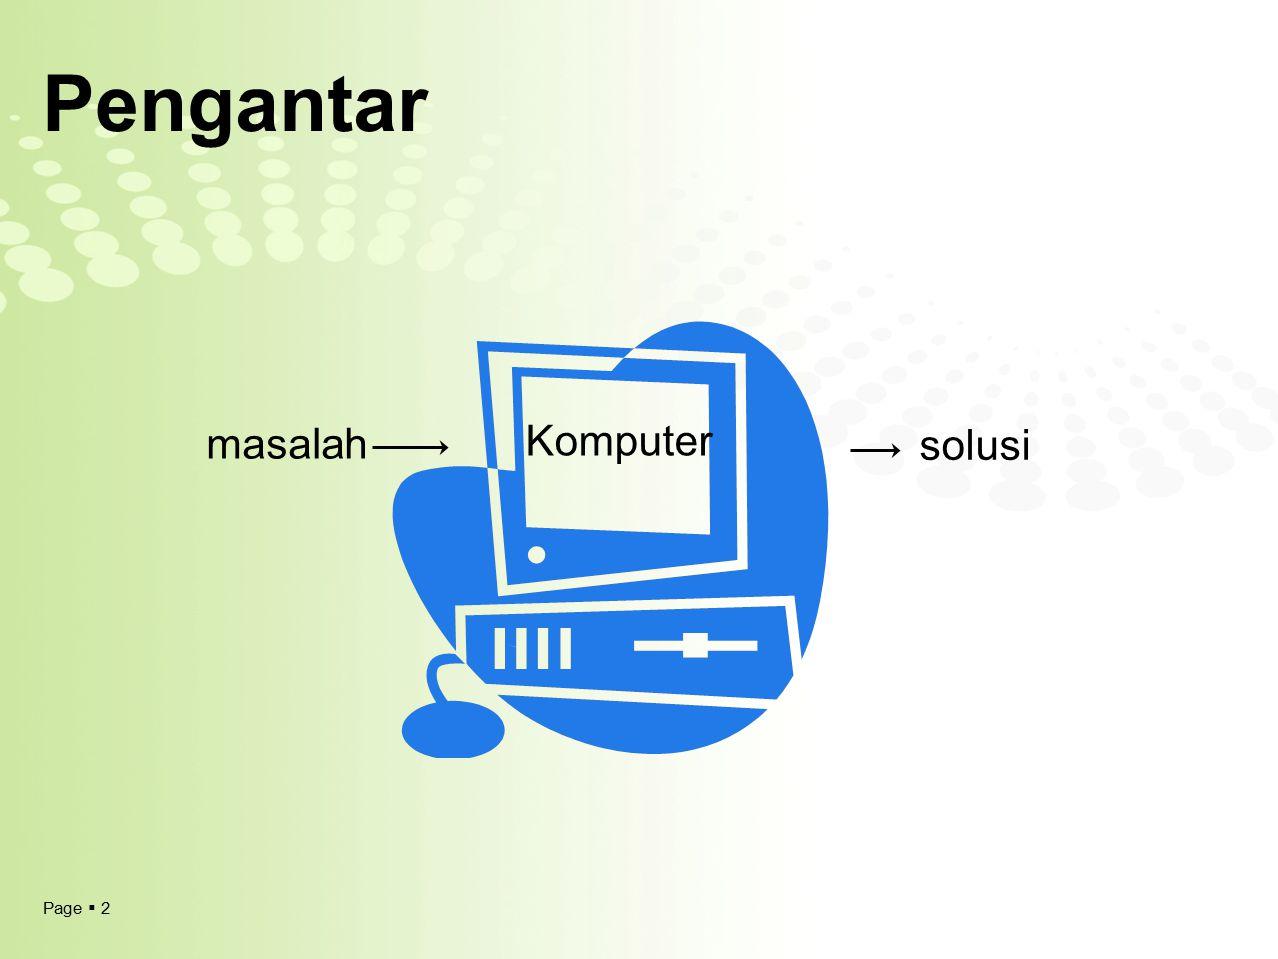 Page  13 PseudoCode Algoritma NAMA_ALGORITMA {uraian singkat mengenai yang akan dilakukan algoritma ini} DEKLARASI {semua nama yang dipakai, meliputi nama tipe, nama tetapan, nama peubah, nama prosedur, dan nama fungsi didefinisikan di sini} DESKRIPSI {semua langkah / aksi algoritma dituliskan di sini} DEKLARASI Nilai_Angka, Rata_rata : real K : integer R : char Contoh Deklarasi Variabel DEKLARASI Const pi = 3.14 Const max = 250 Const min = 1 Contoh Deklarasi Konstanta Variabel vs Konstanta ?